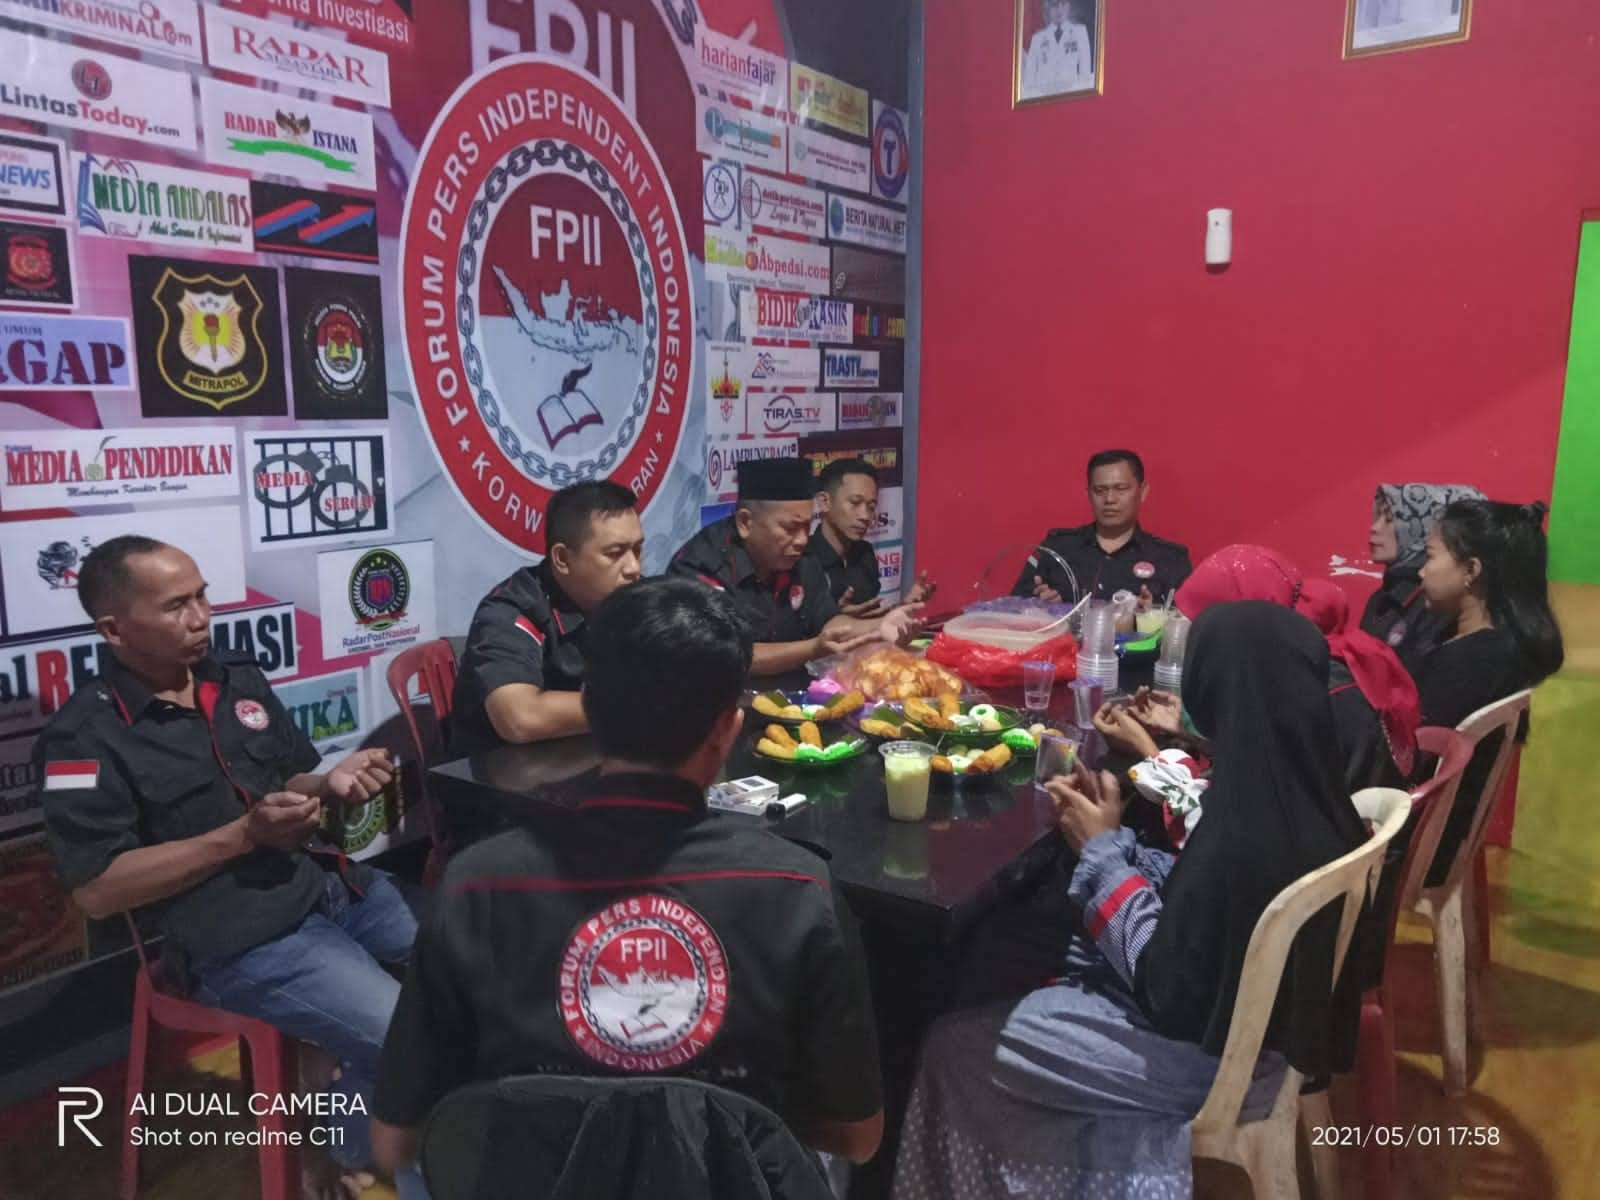 Jalin Silaturrahmi dan Kekompakan FPII Korwil Pesawaran Gelar Buka Puasa Bersama